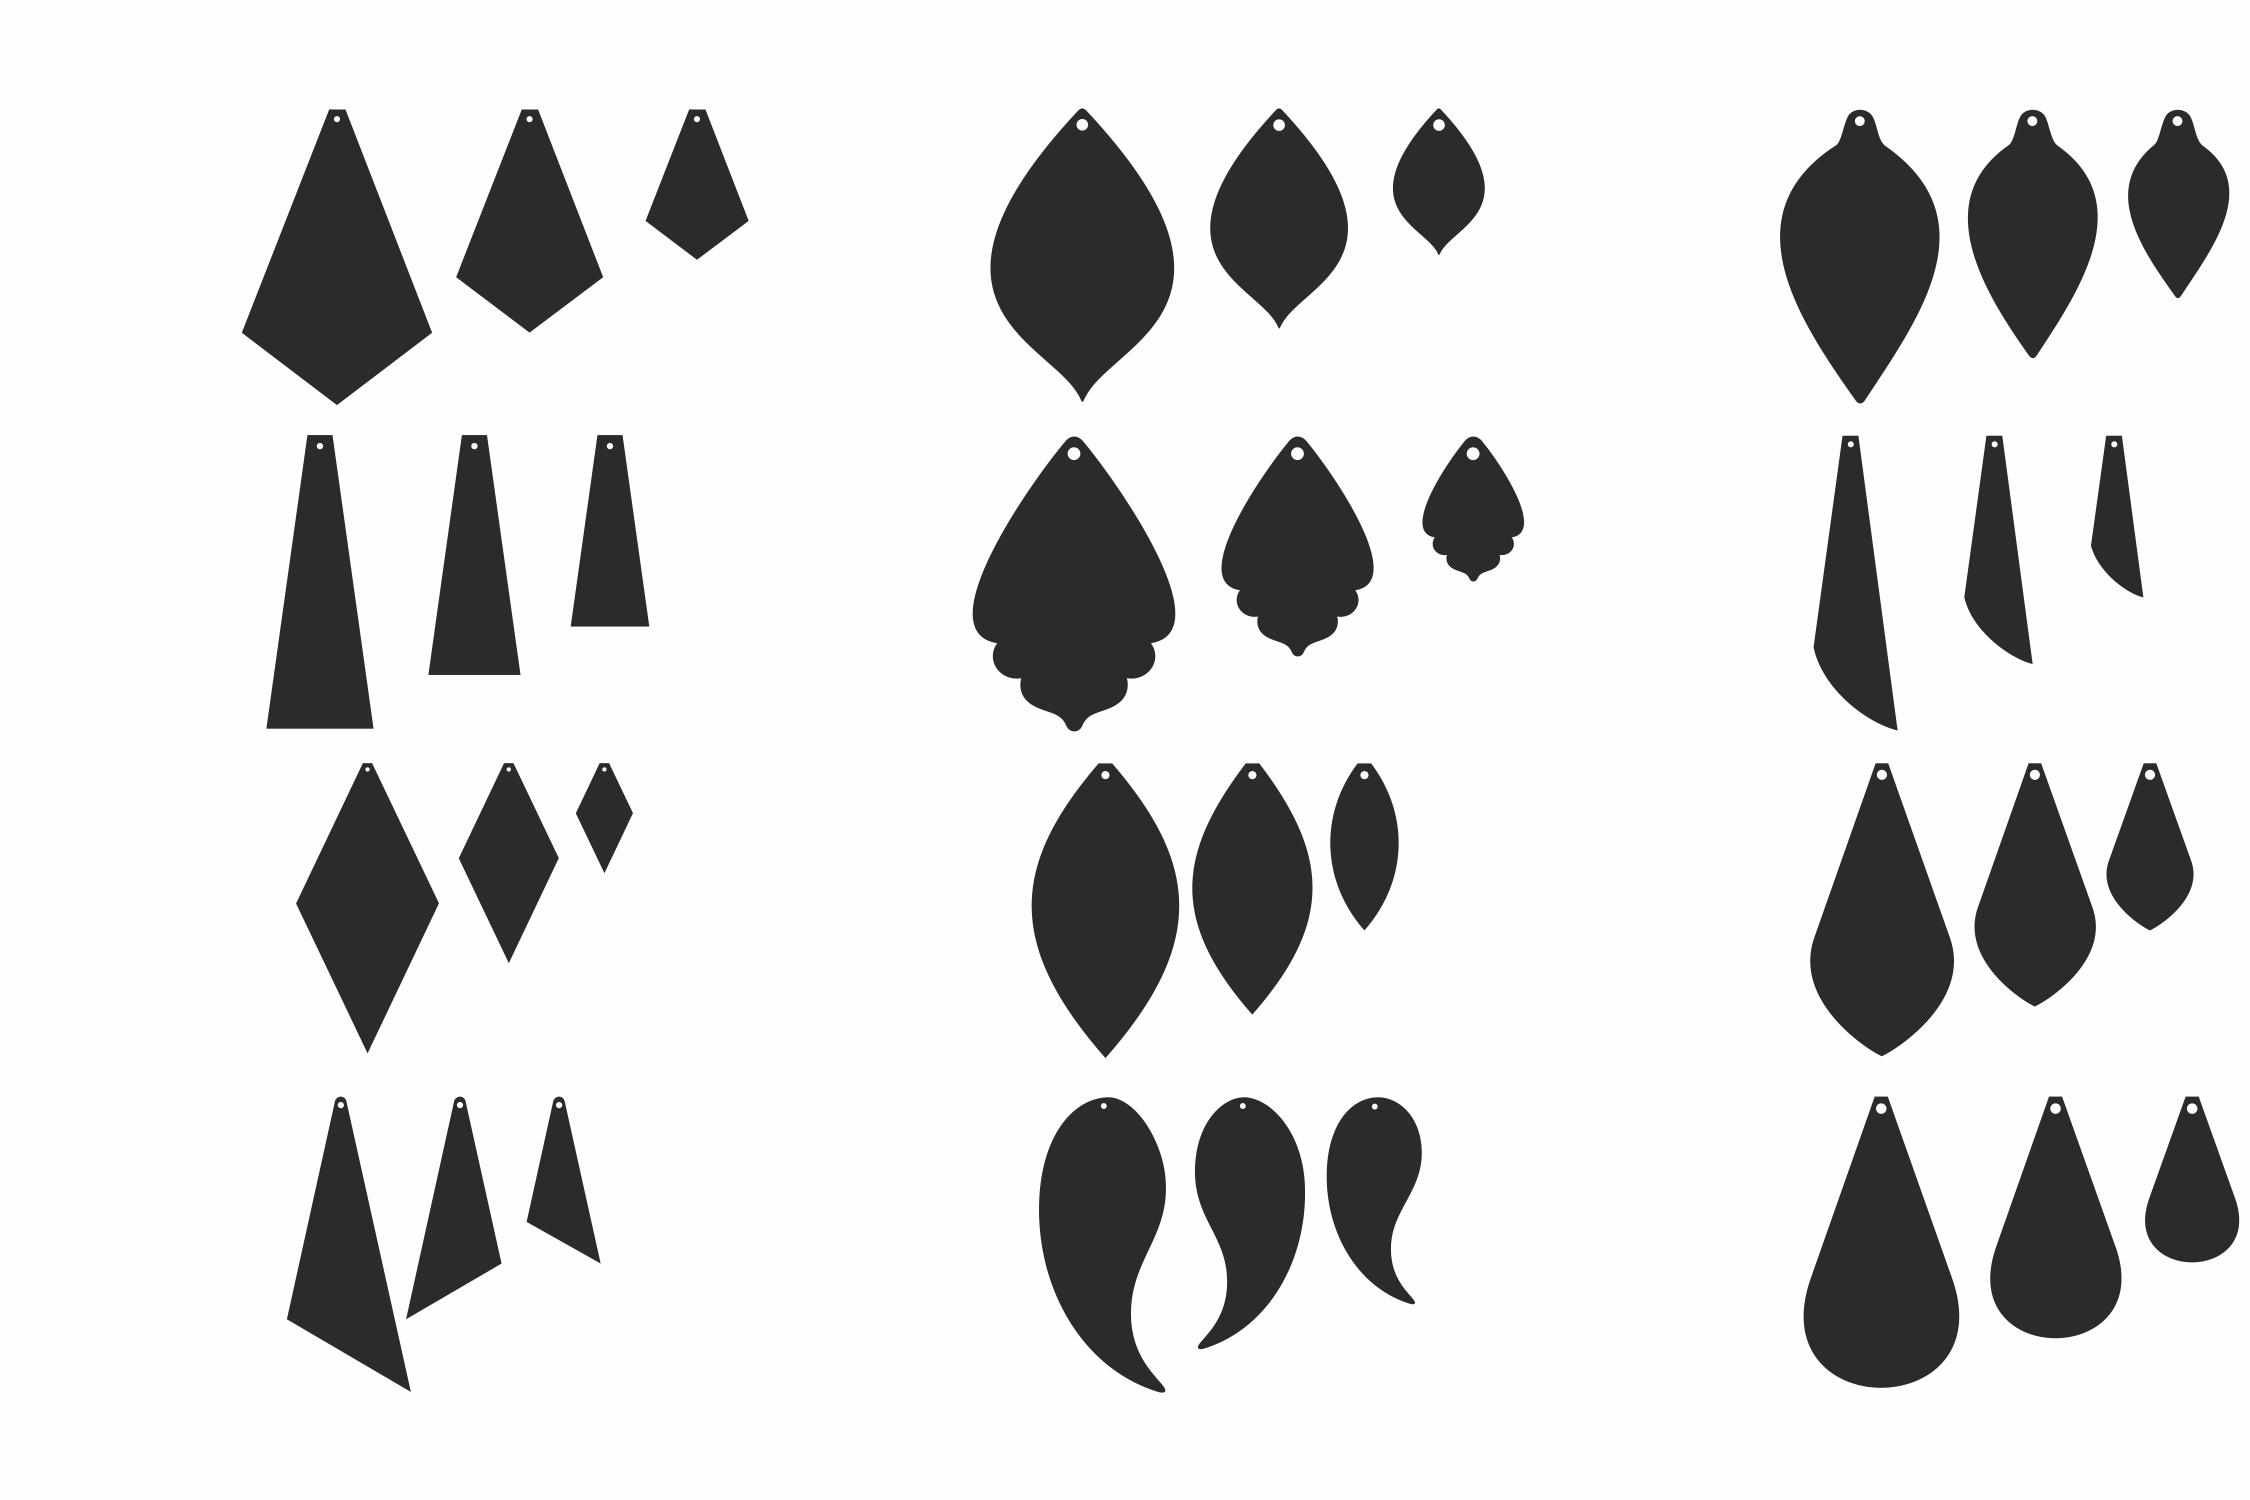 Leather Earrings Earrings Svg Pendant Template Cut Files